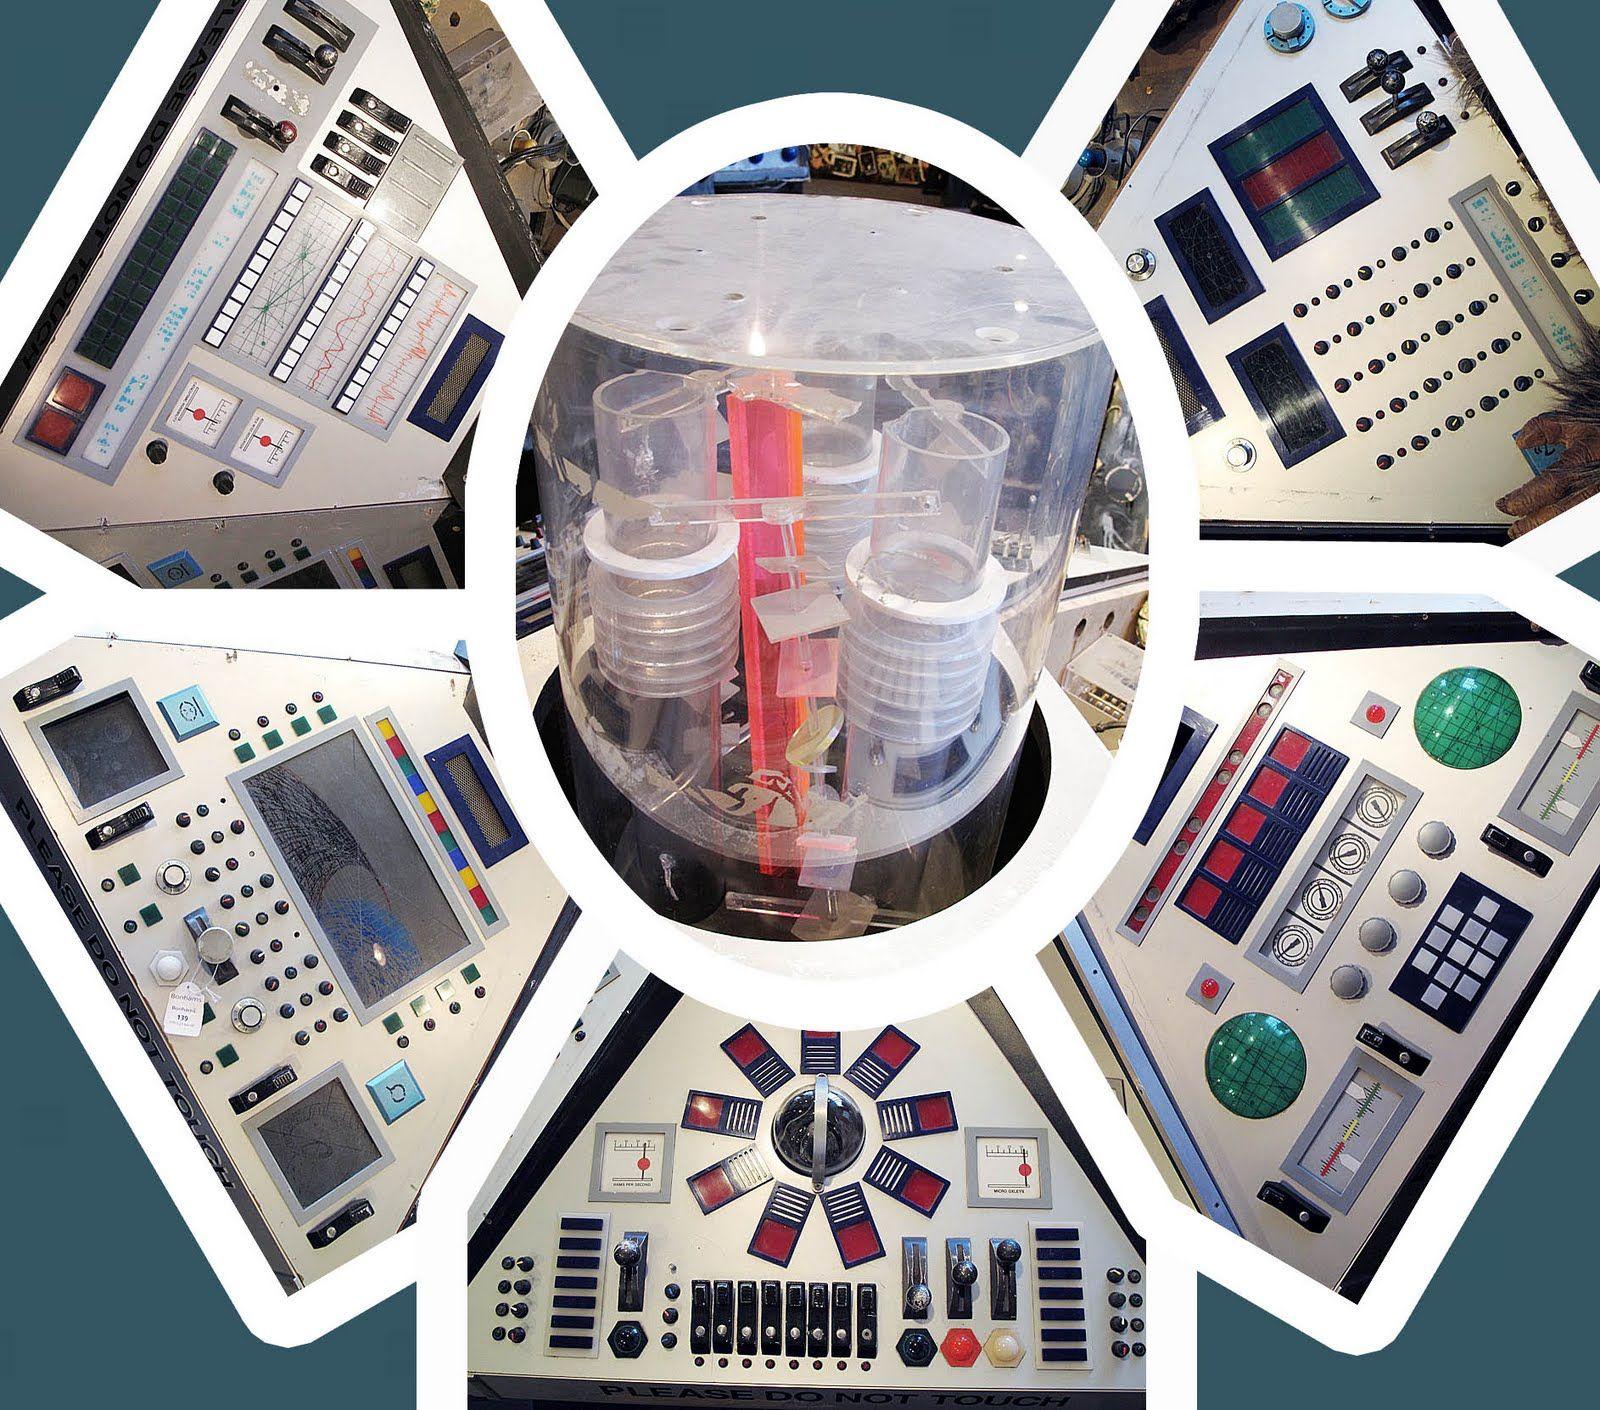 TARDIS+console.jpg (1600×1410)